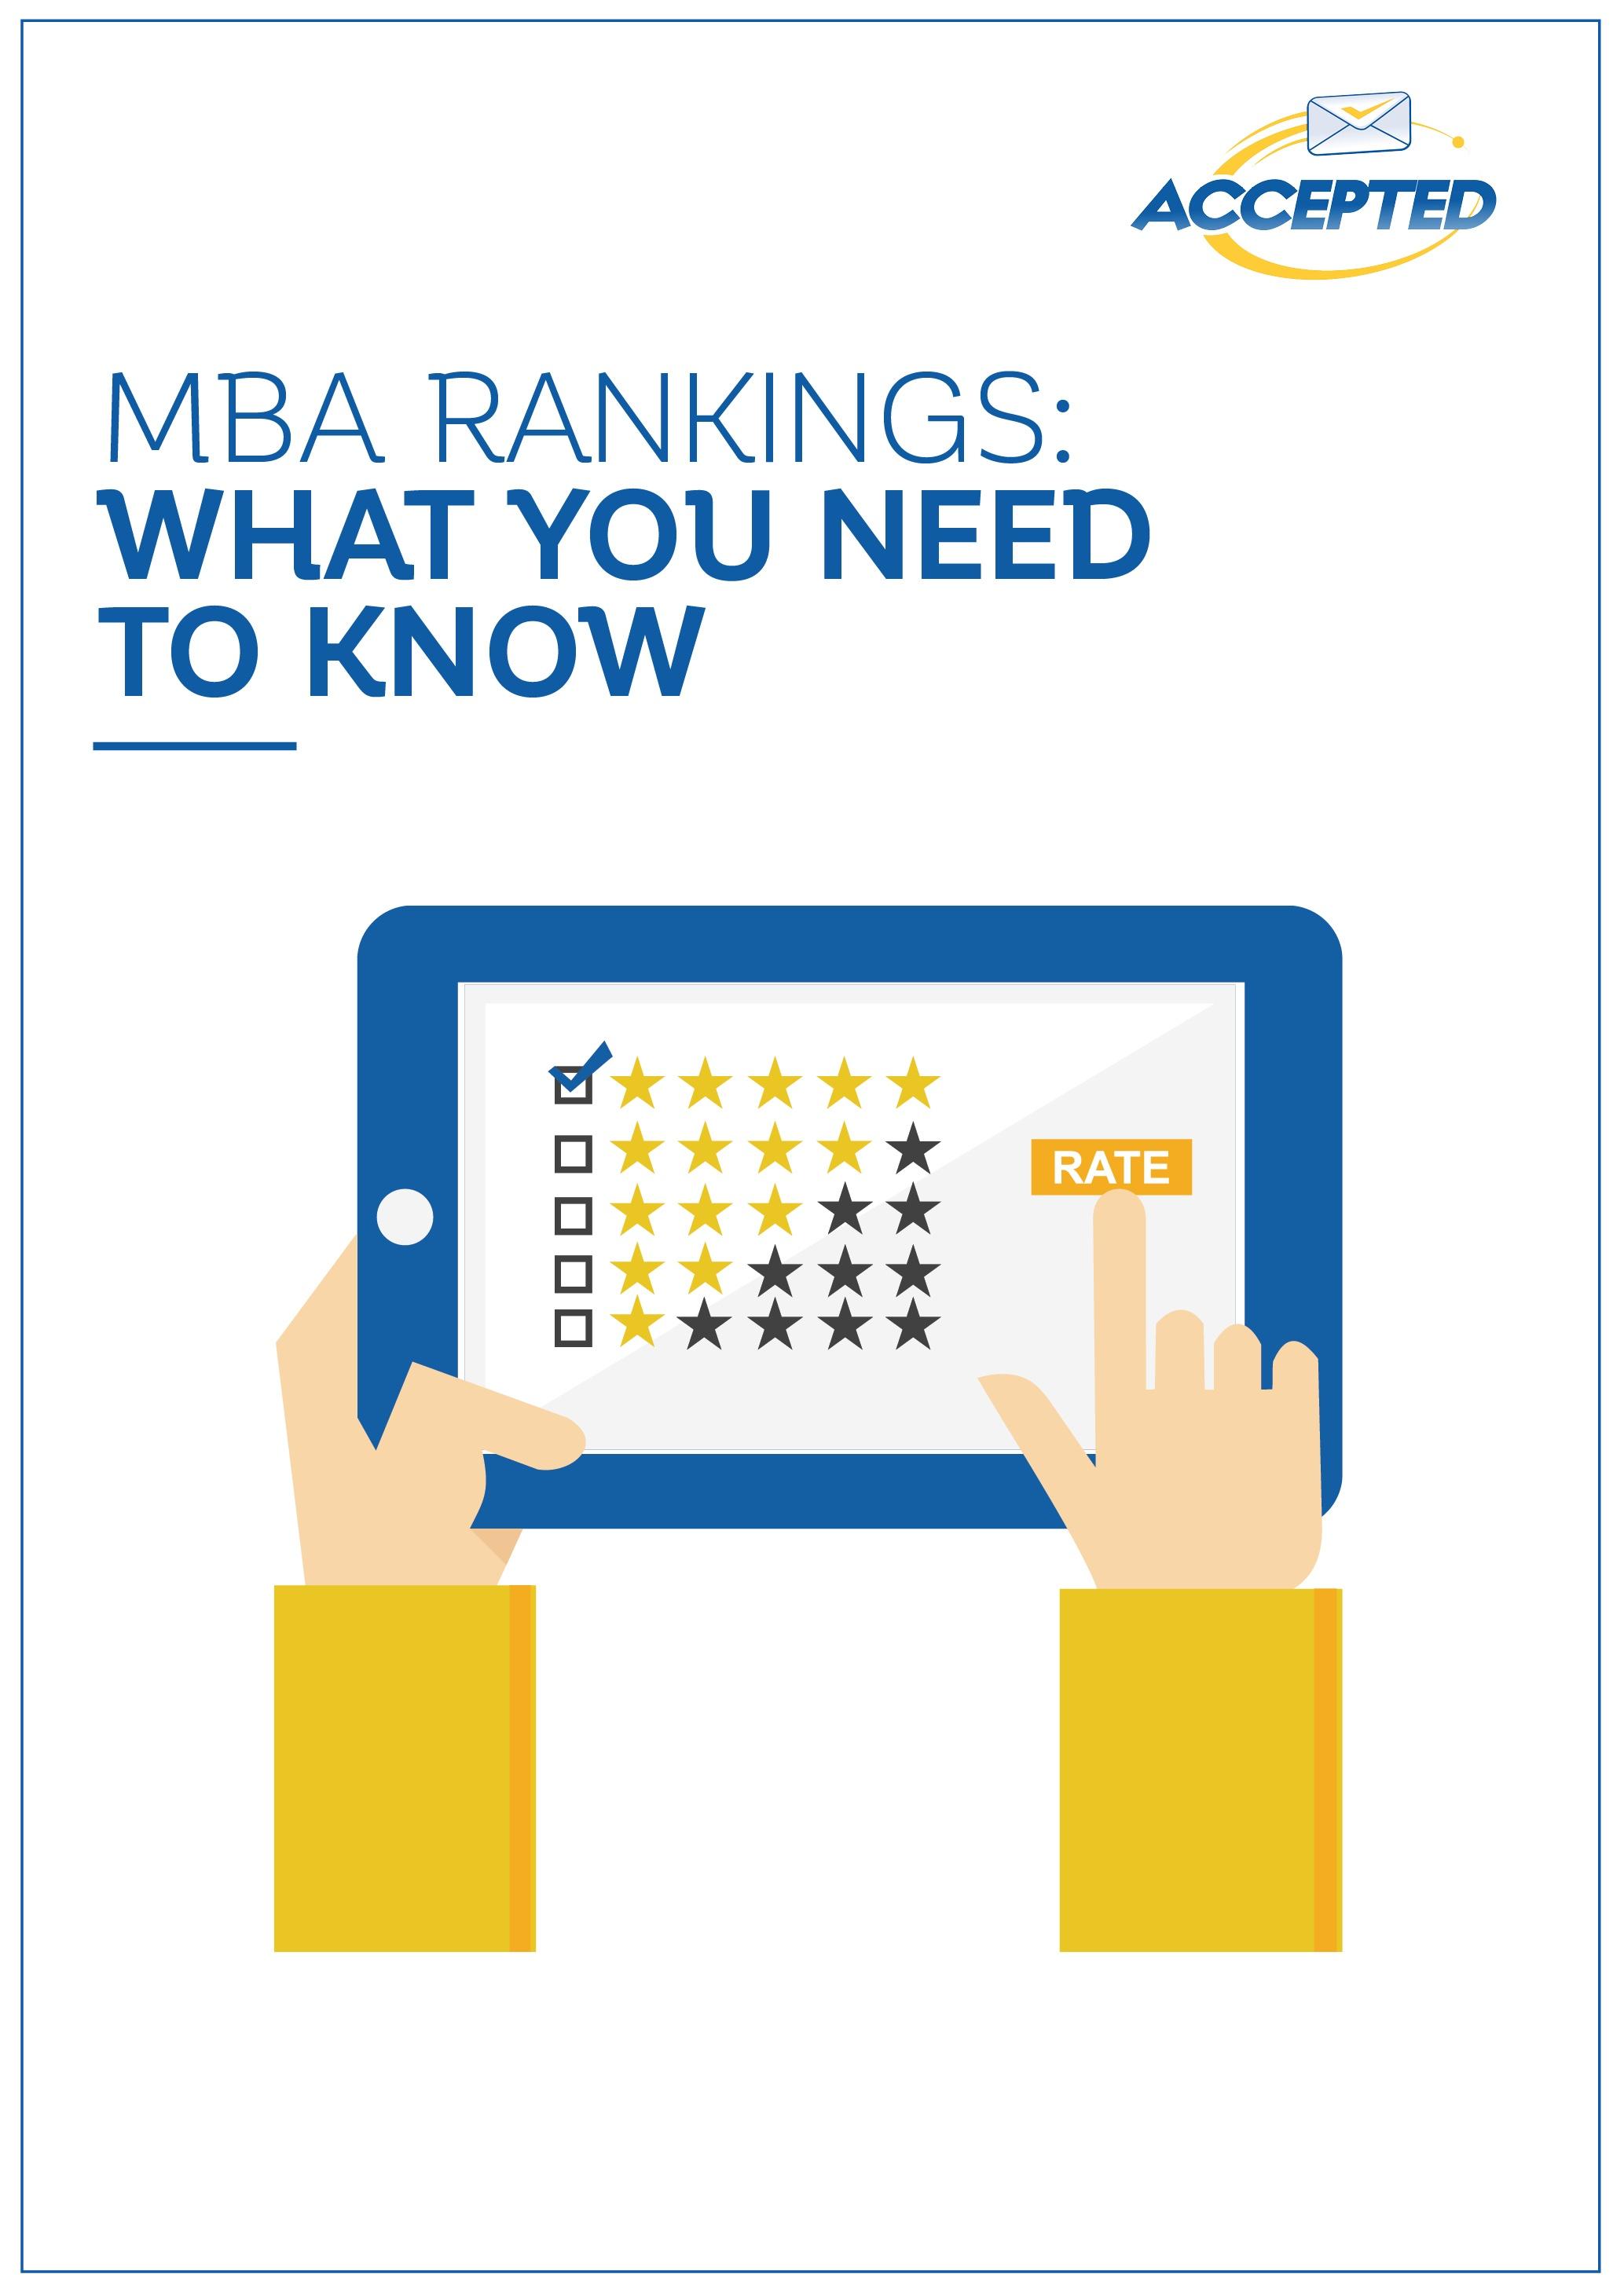 mba_ranking.jpg